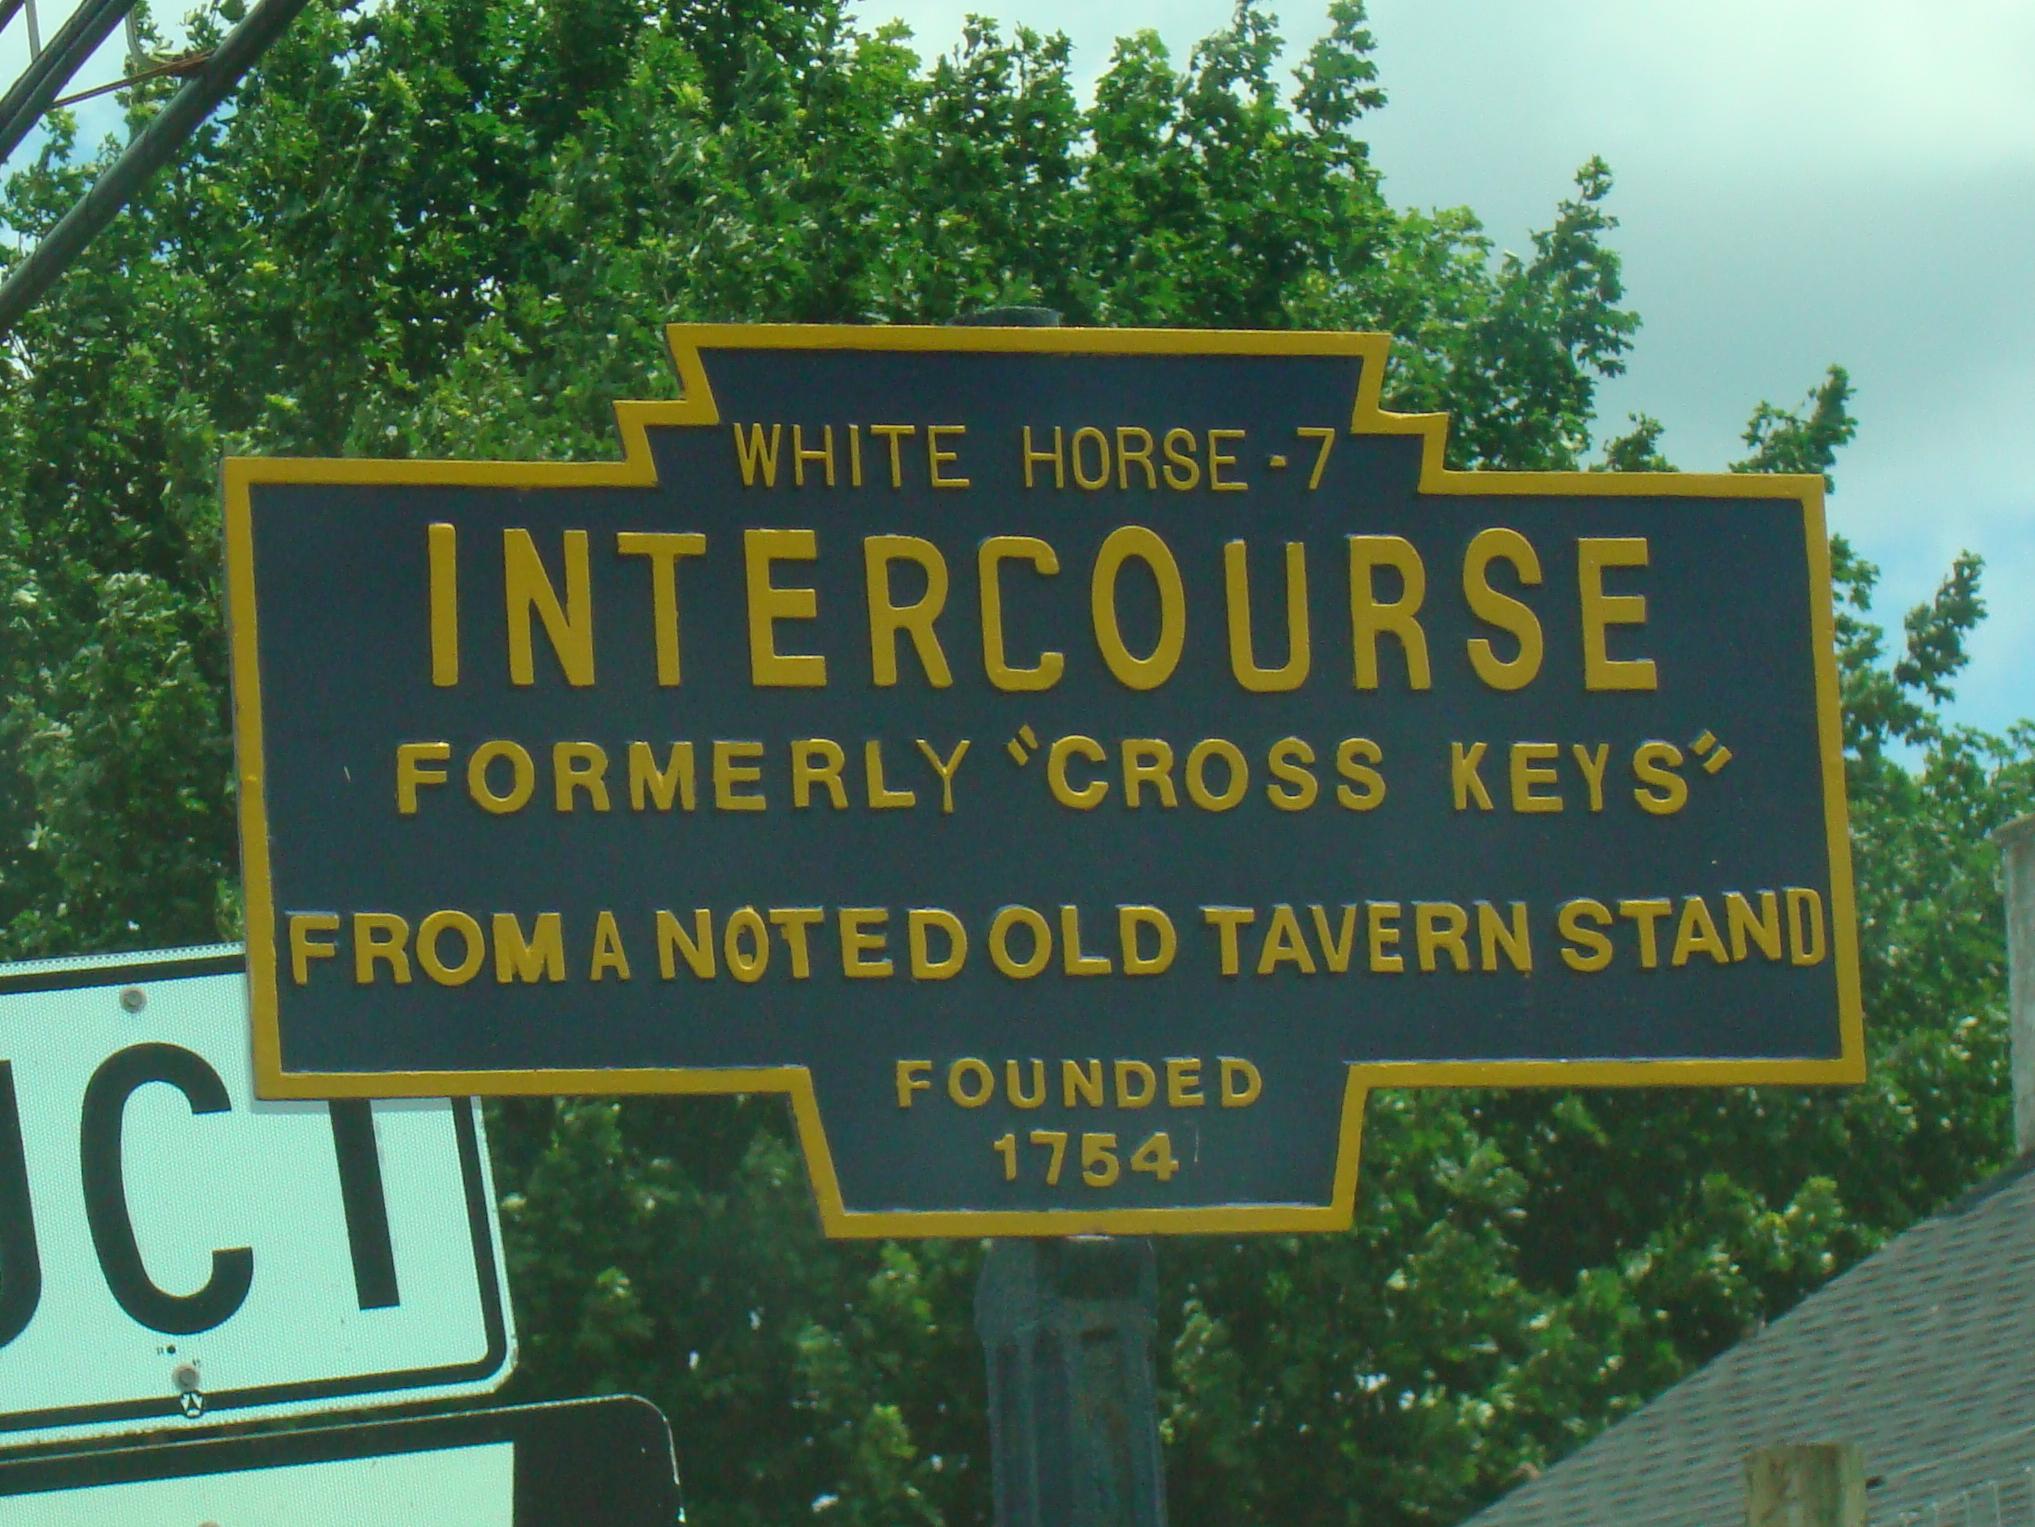 Intercourse%2C_PA_Keystone_Marker_Route_